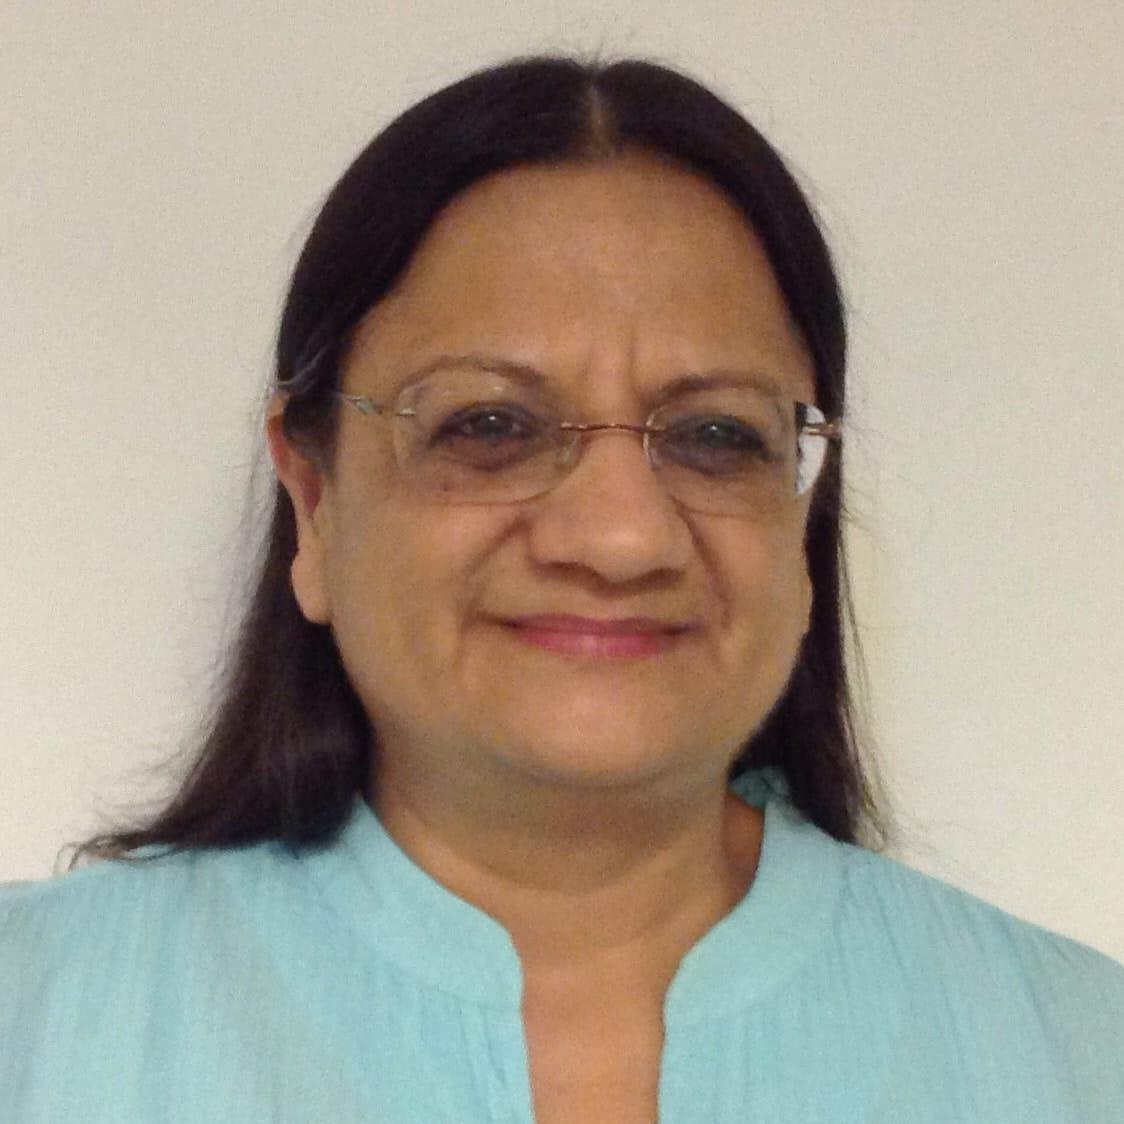 Bhavna Patani - Photo 1